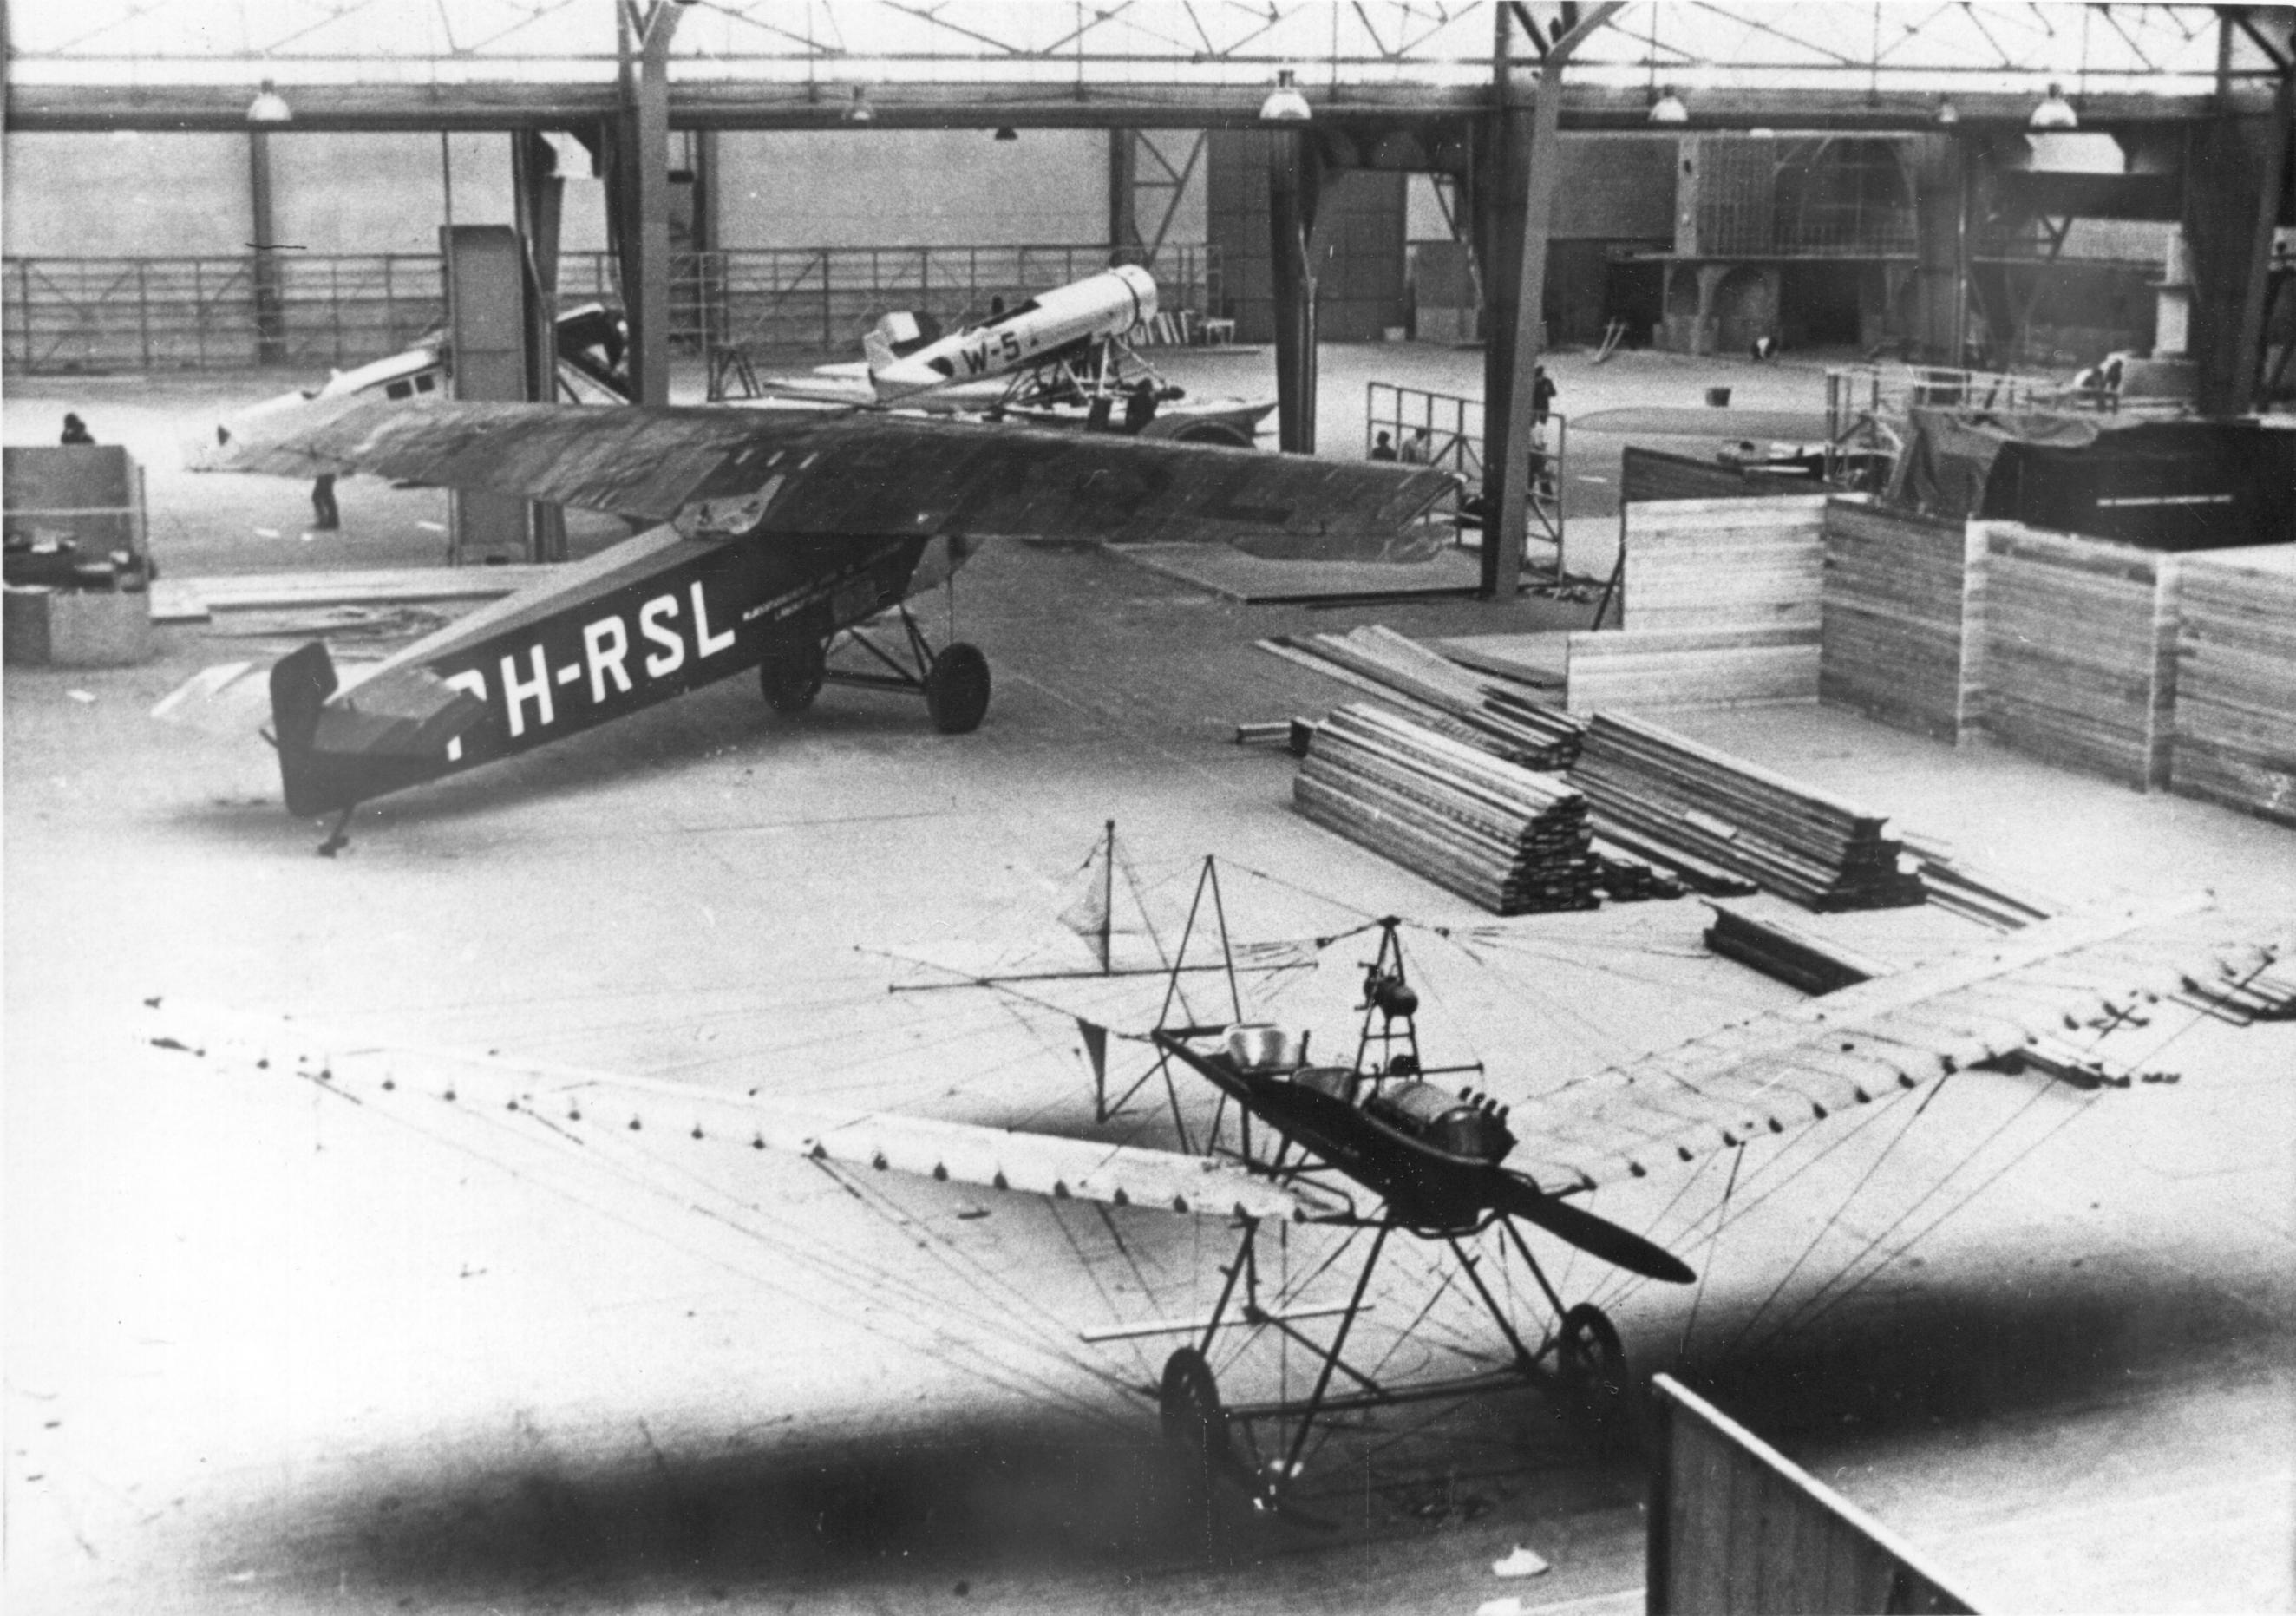 Naam: Schiphol 1939 FK26, C-11, F-7a, Spin via GJTORNIJ.jpg Bekeken: 130 Grootte: 515,8 KB